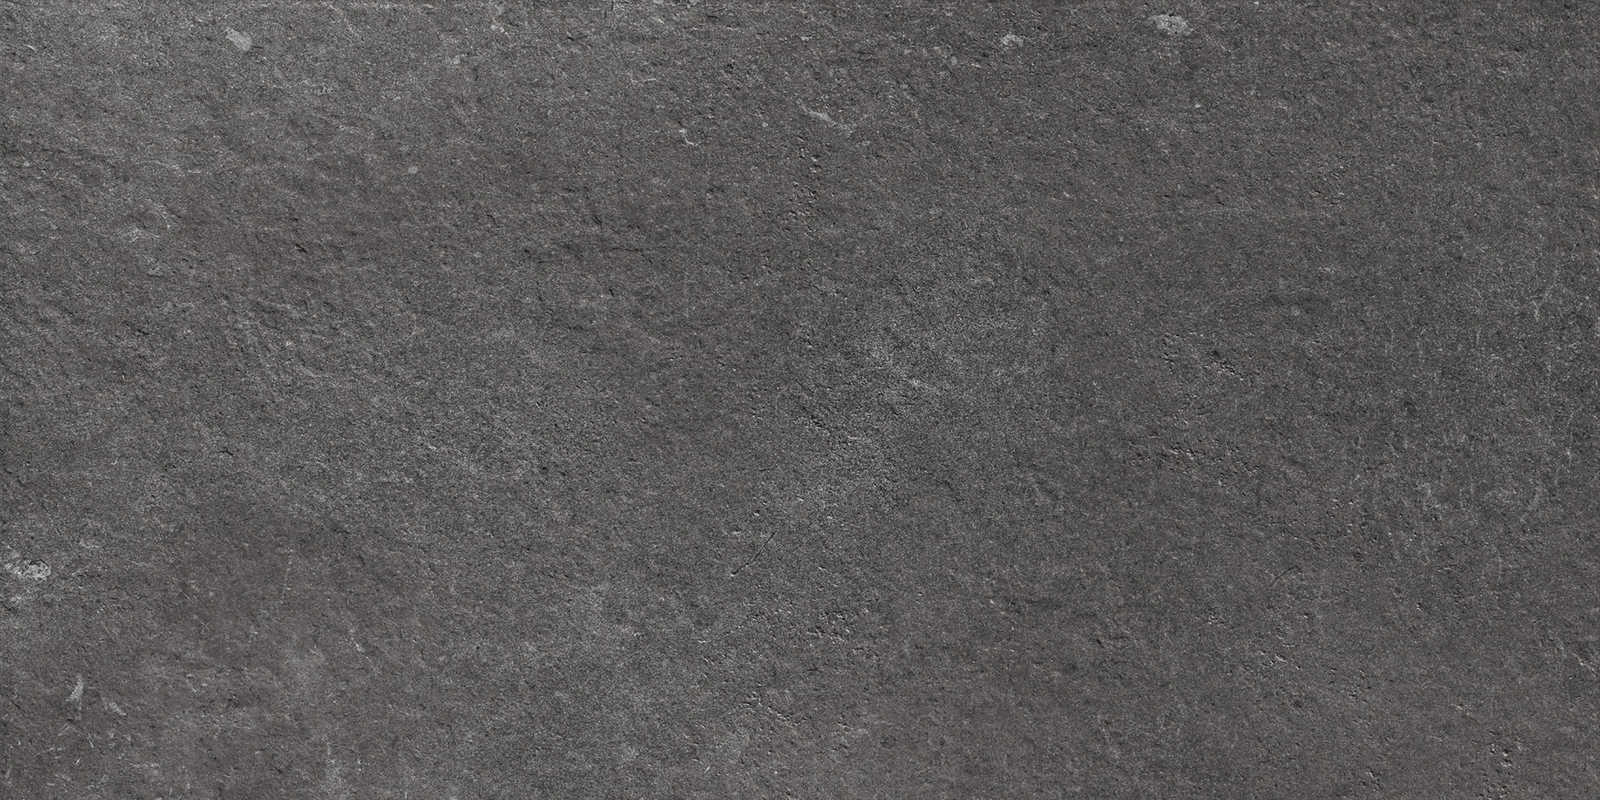 STREAM  OUTDOOR 300X600 ANTHRACITE - (Euro/Mq 16,47)